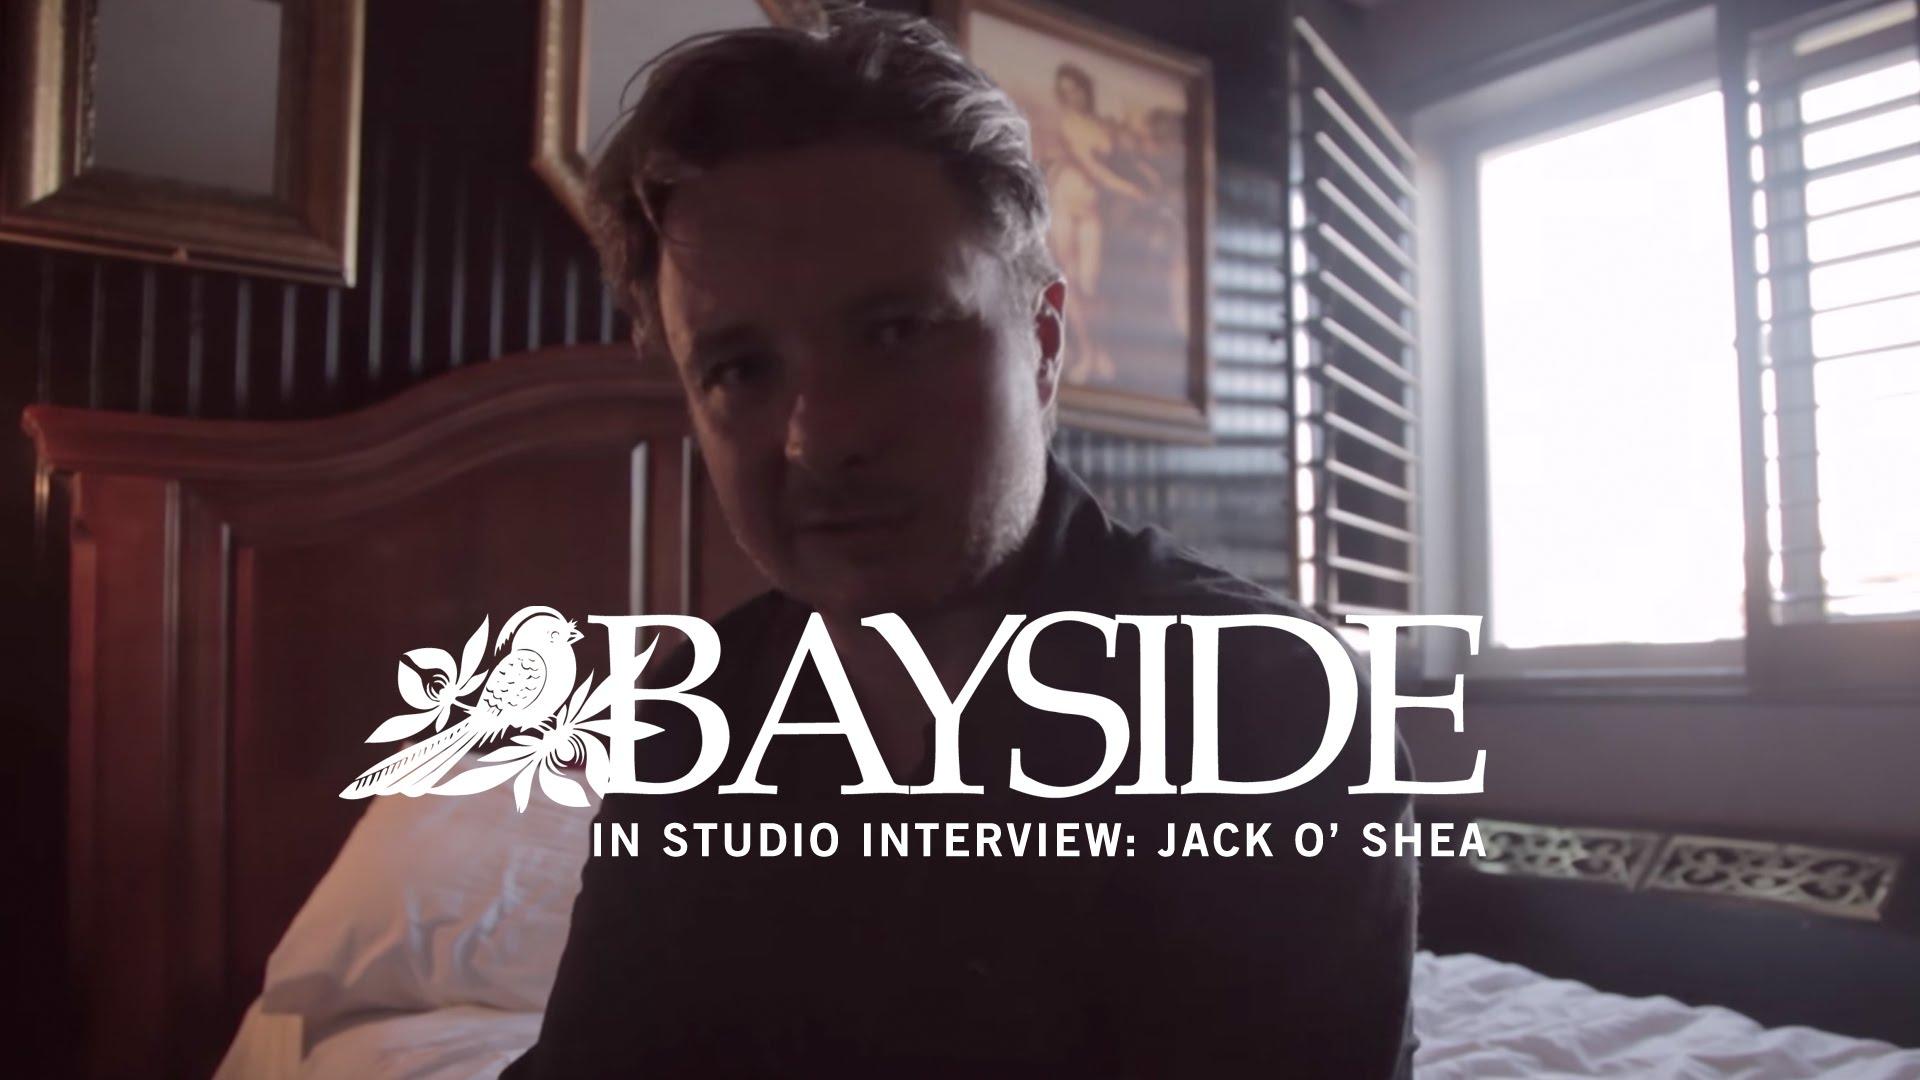 Bayside - In Studio Interview Jack O' Shea